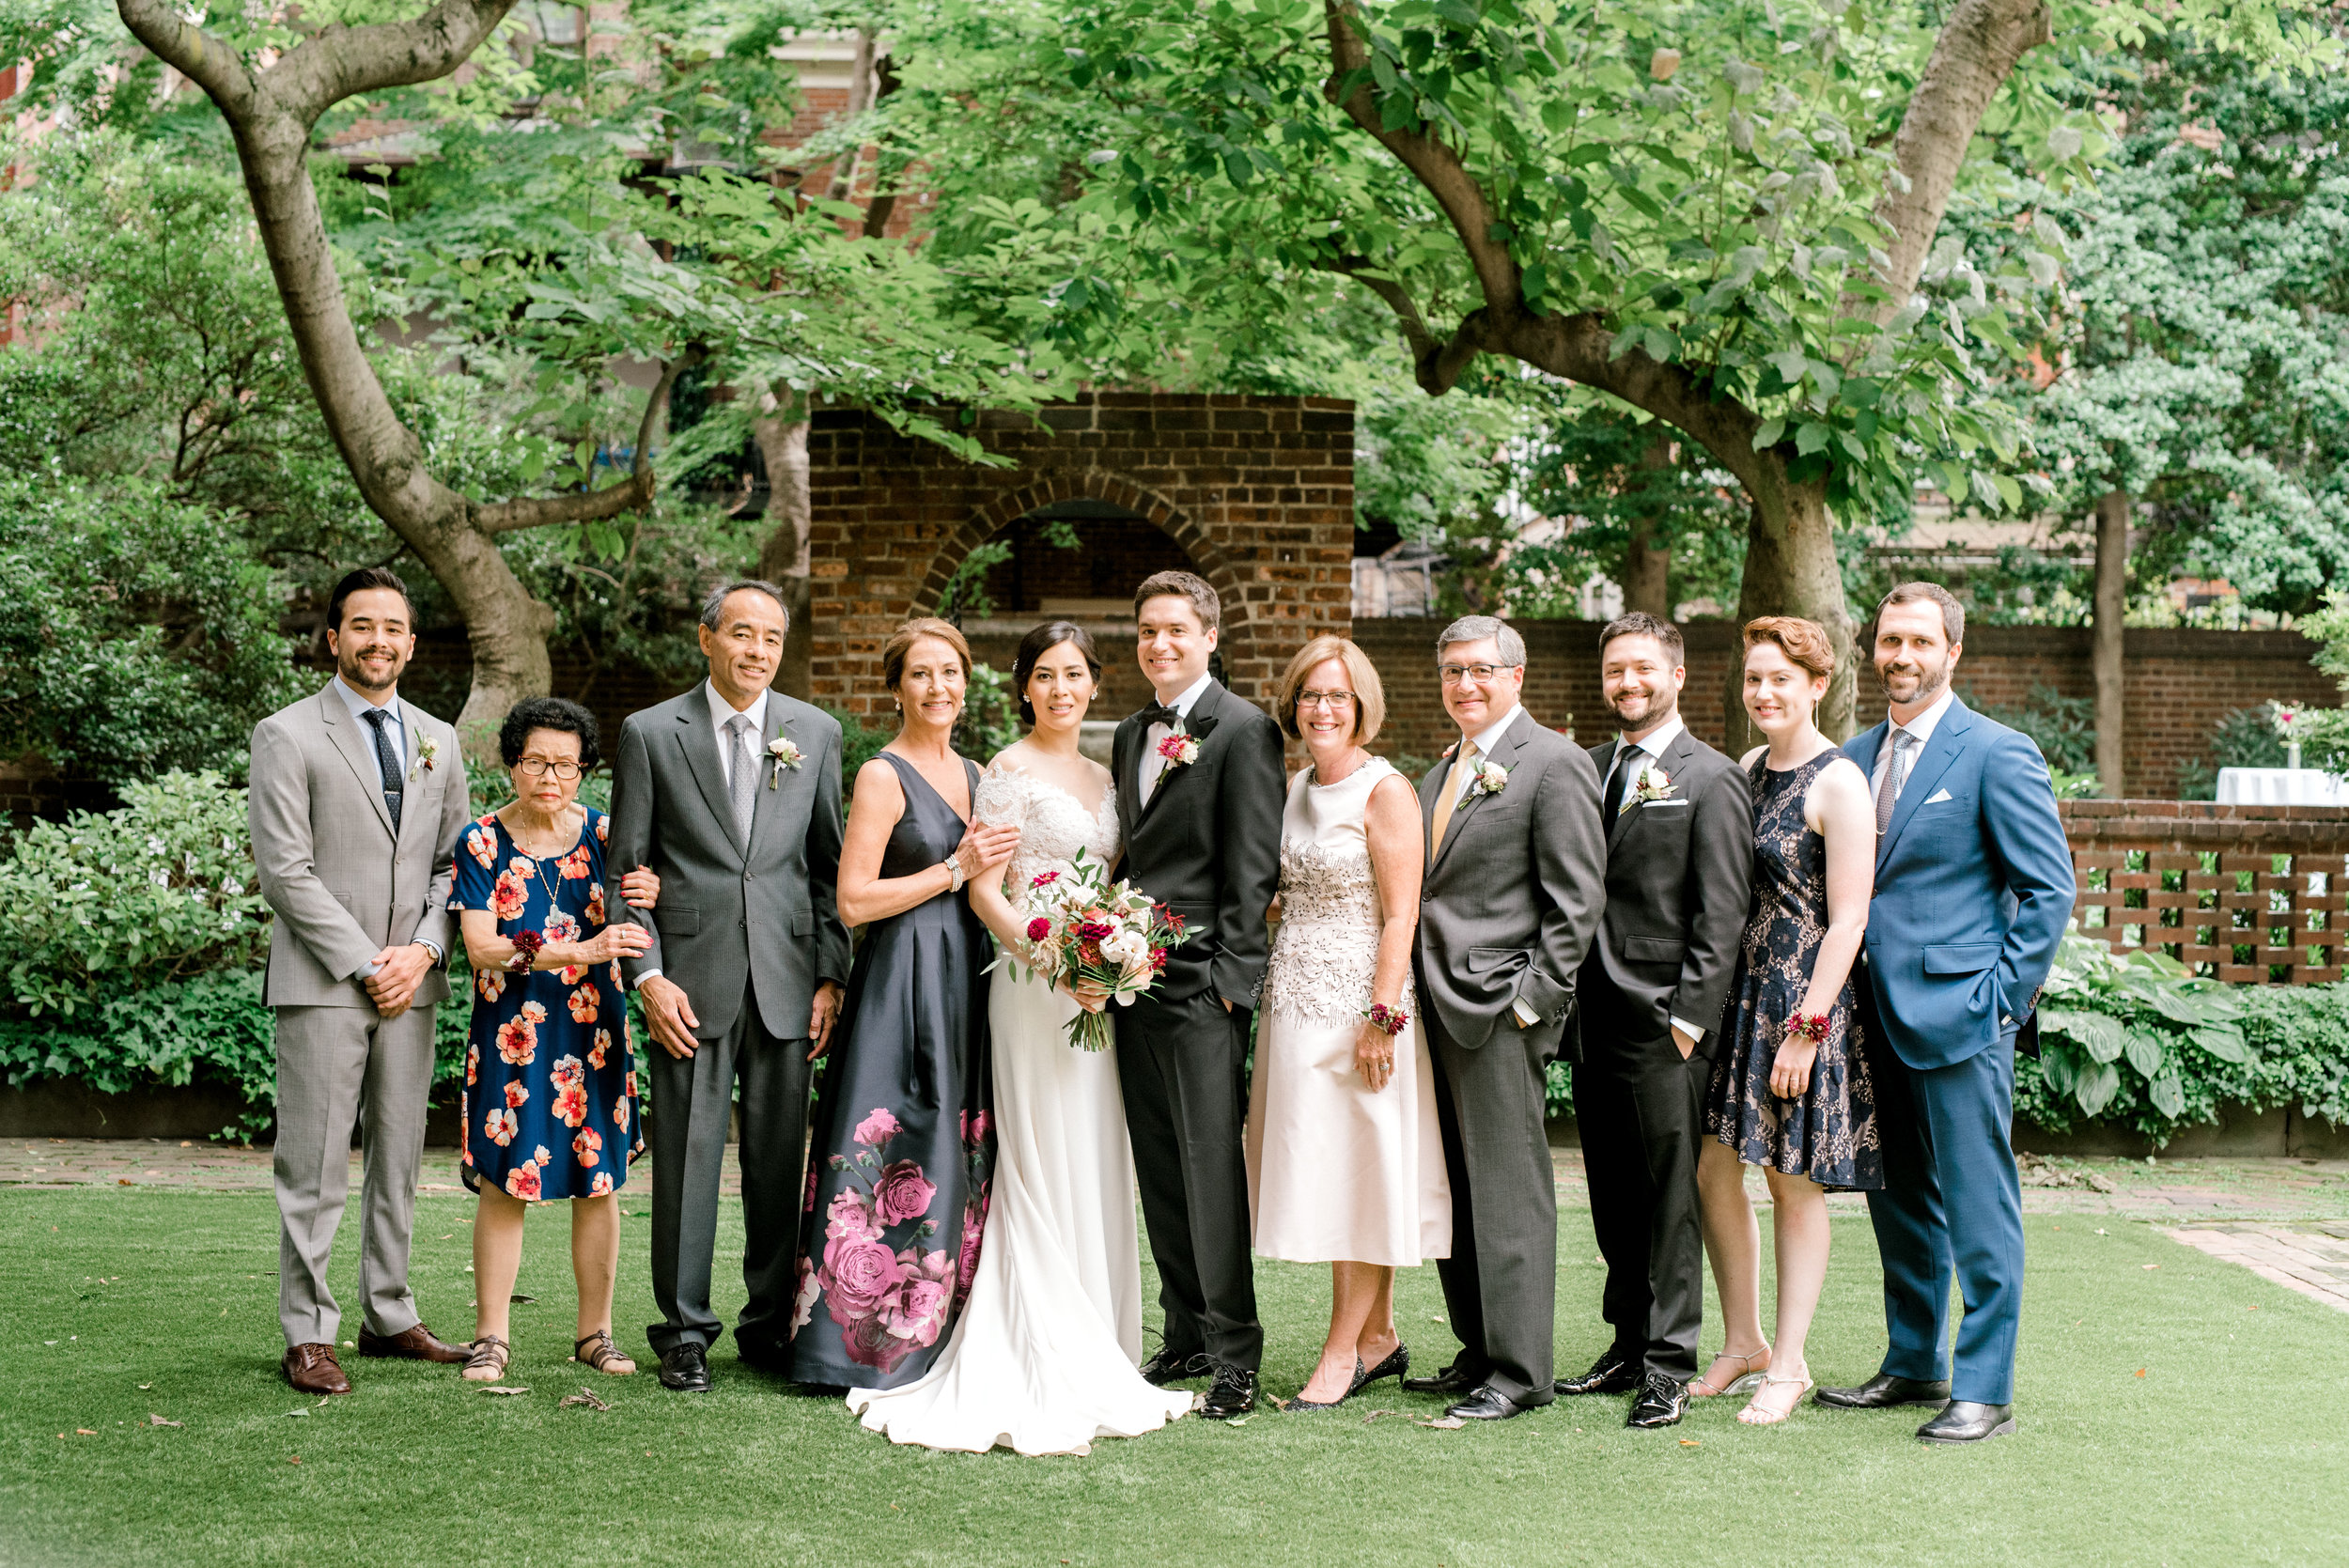 haley-richter-photography-colonial-dames-philadelphia-summer-garden-wedding-133.jpg